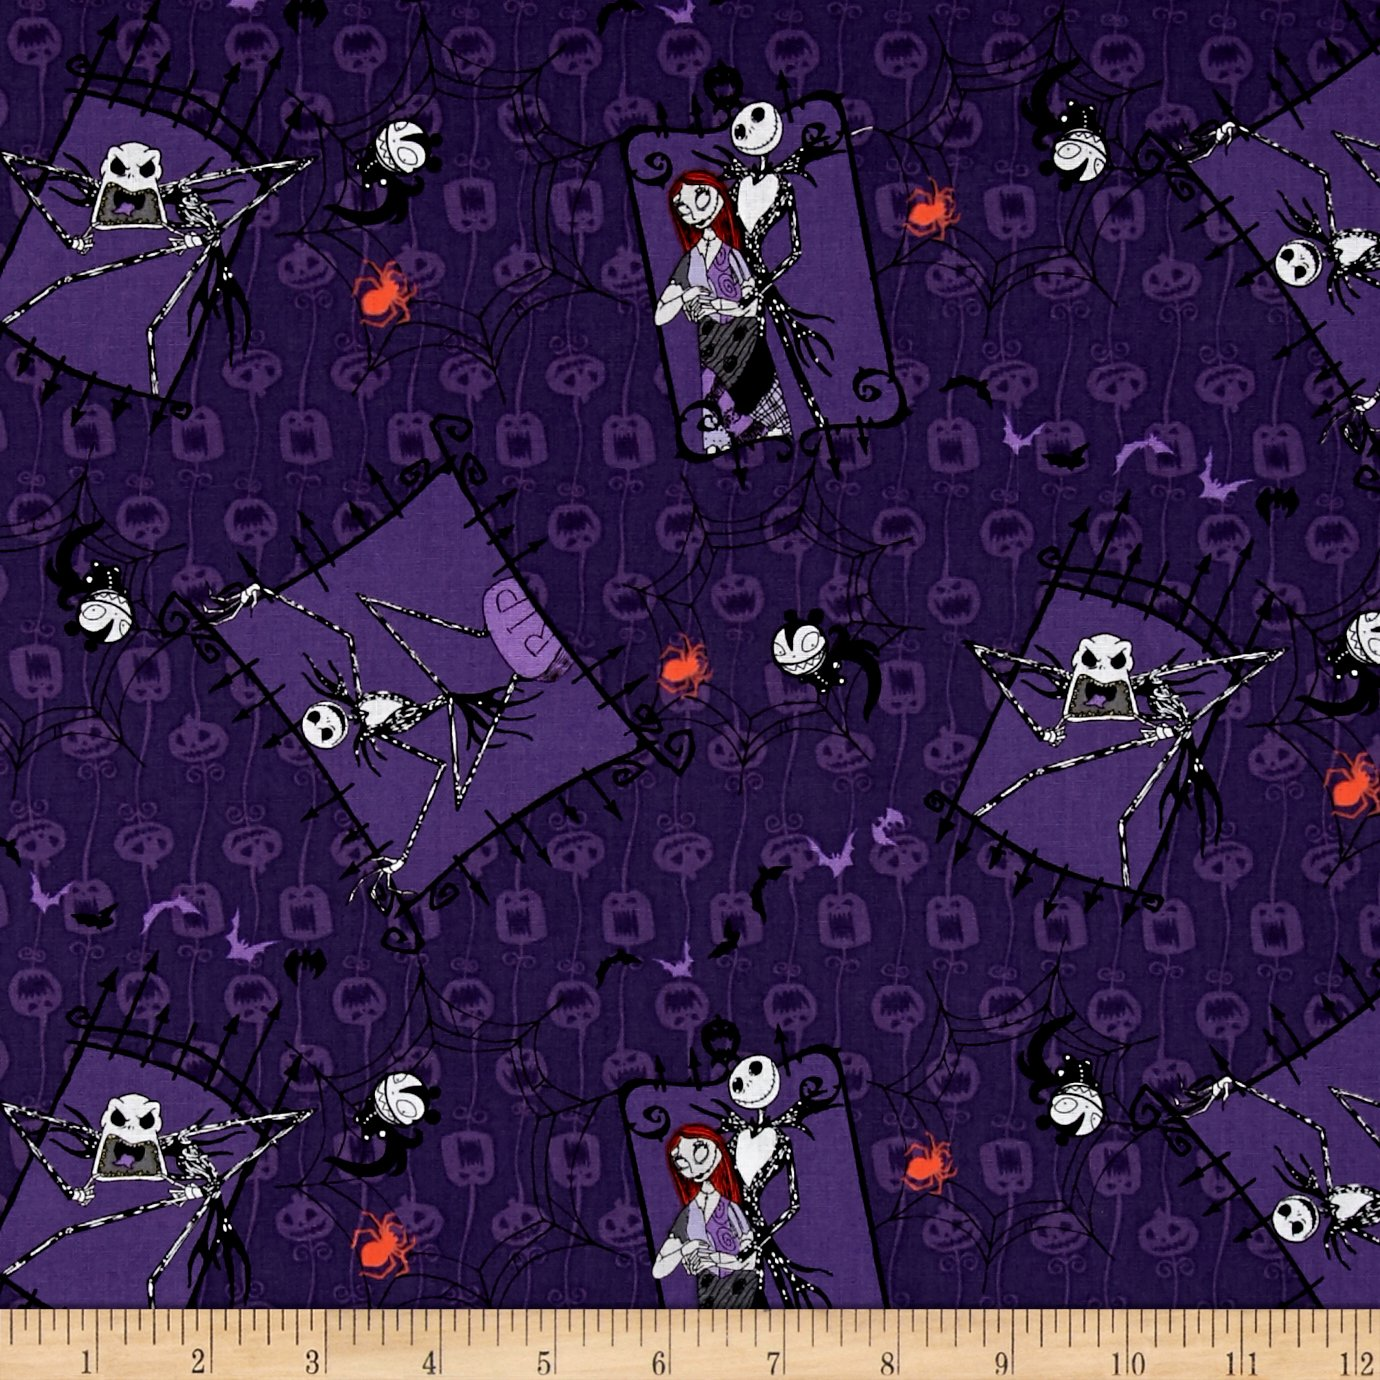 Amazon.com: Disney Nightmare Before Christmas Couple Purple Fabric ...